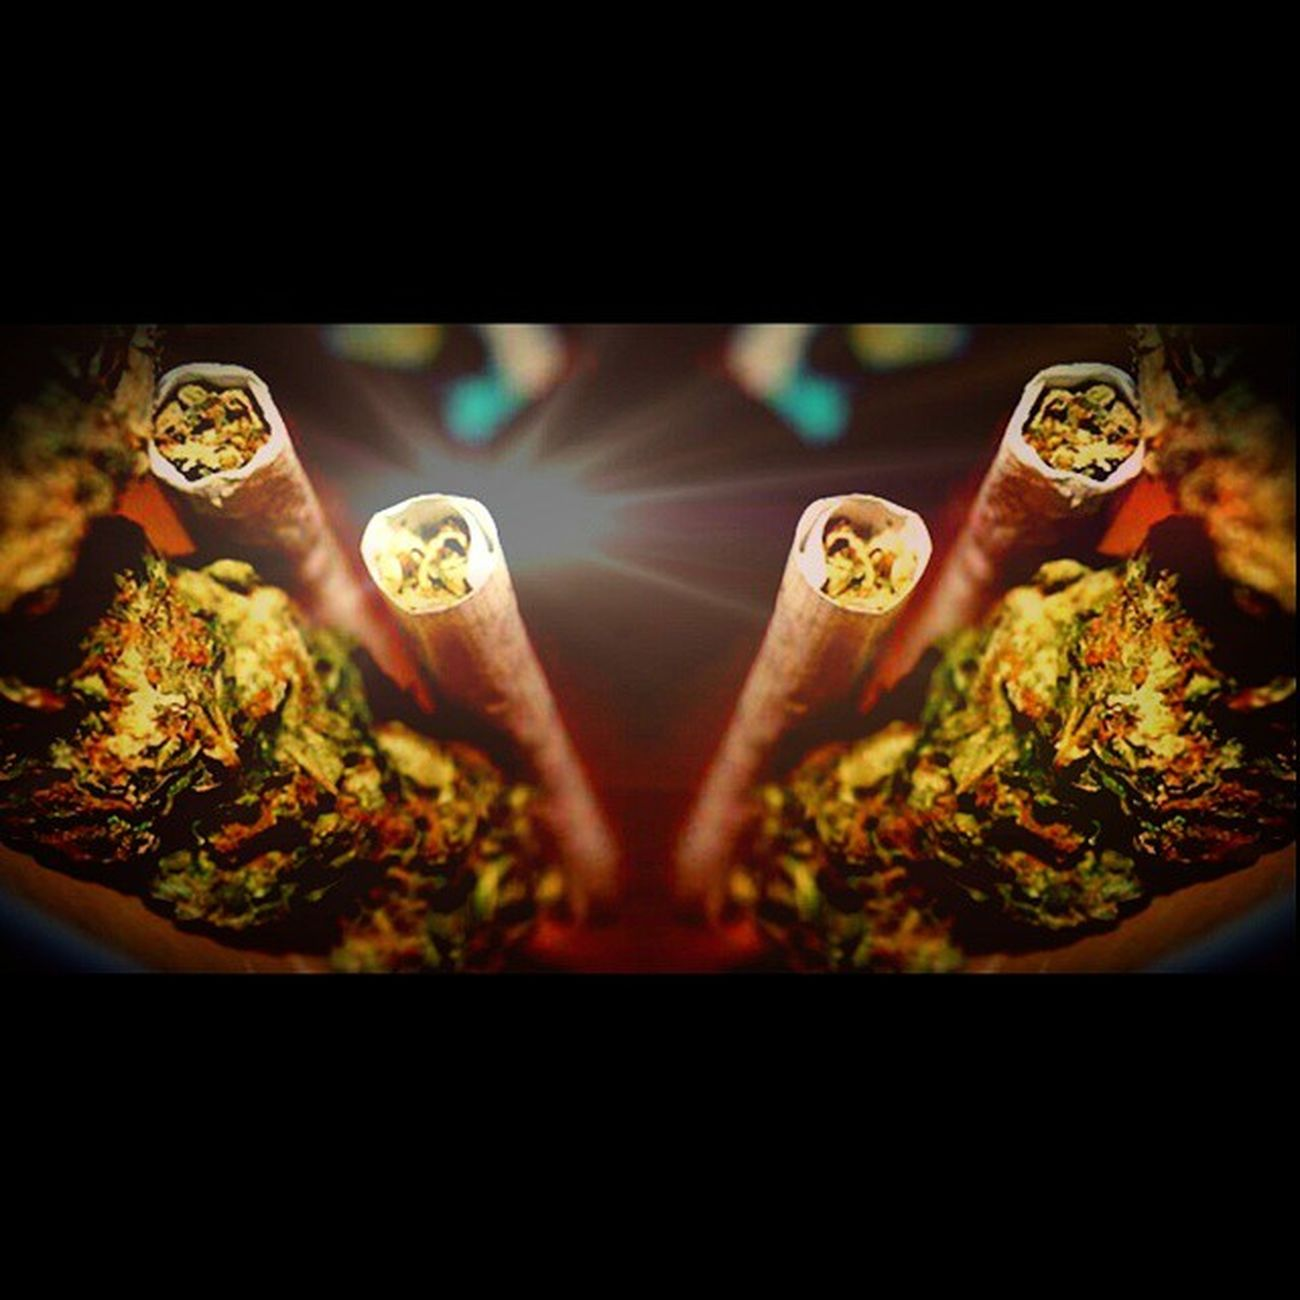 Enjoying some MMJ Medical Wayfo Chronic  marijuana ganja living that klco420 highsociety topshelflife stonernation